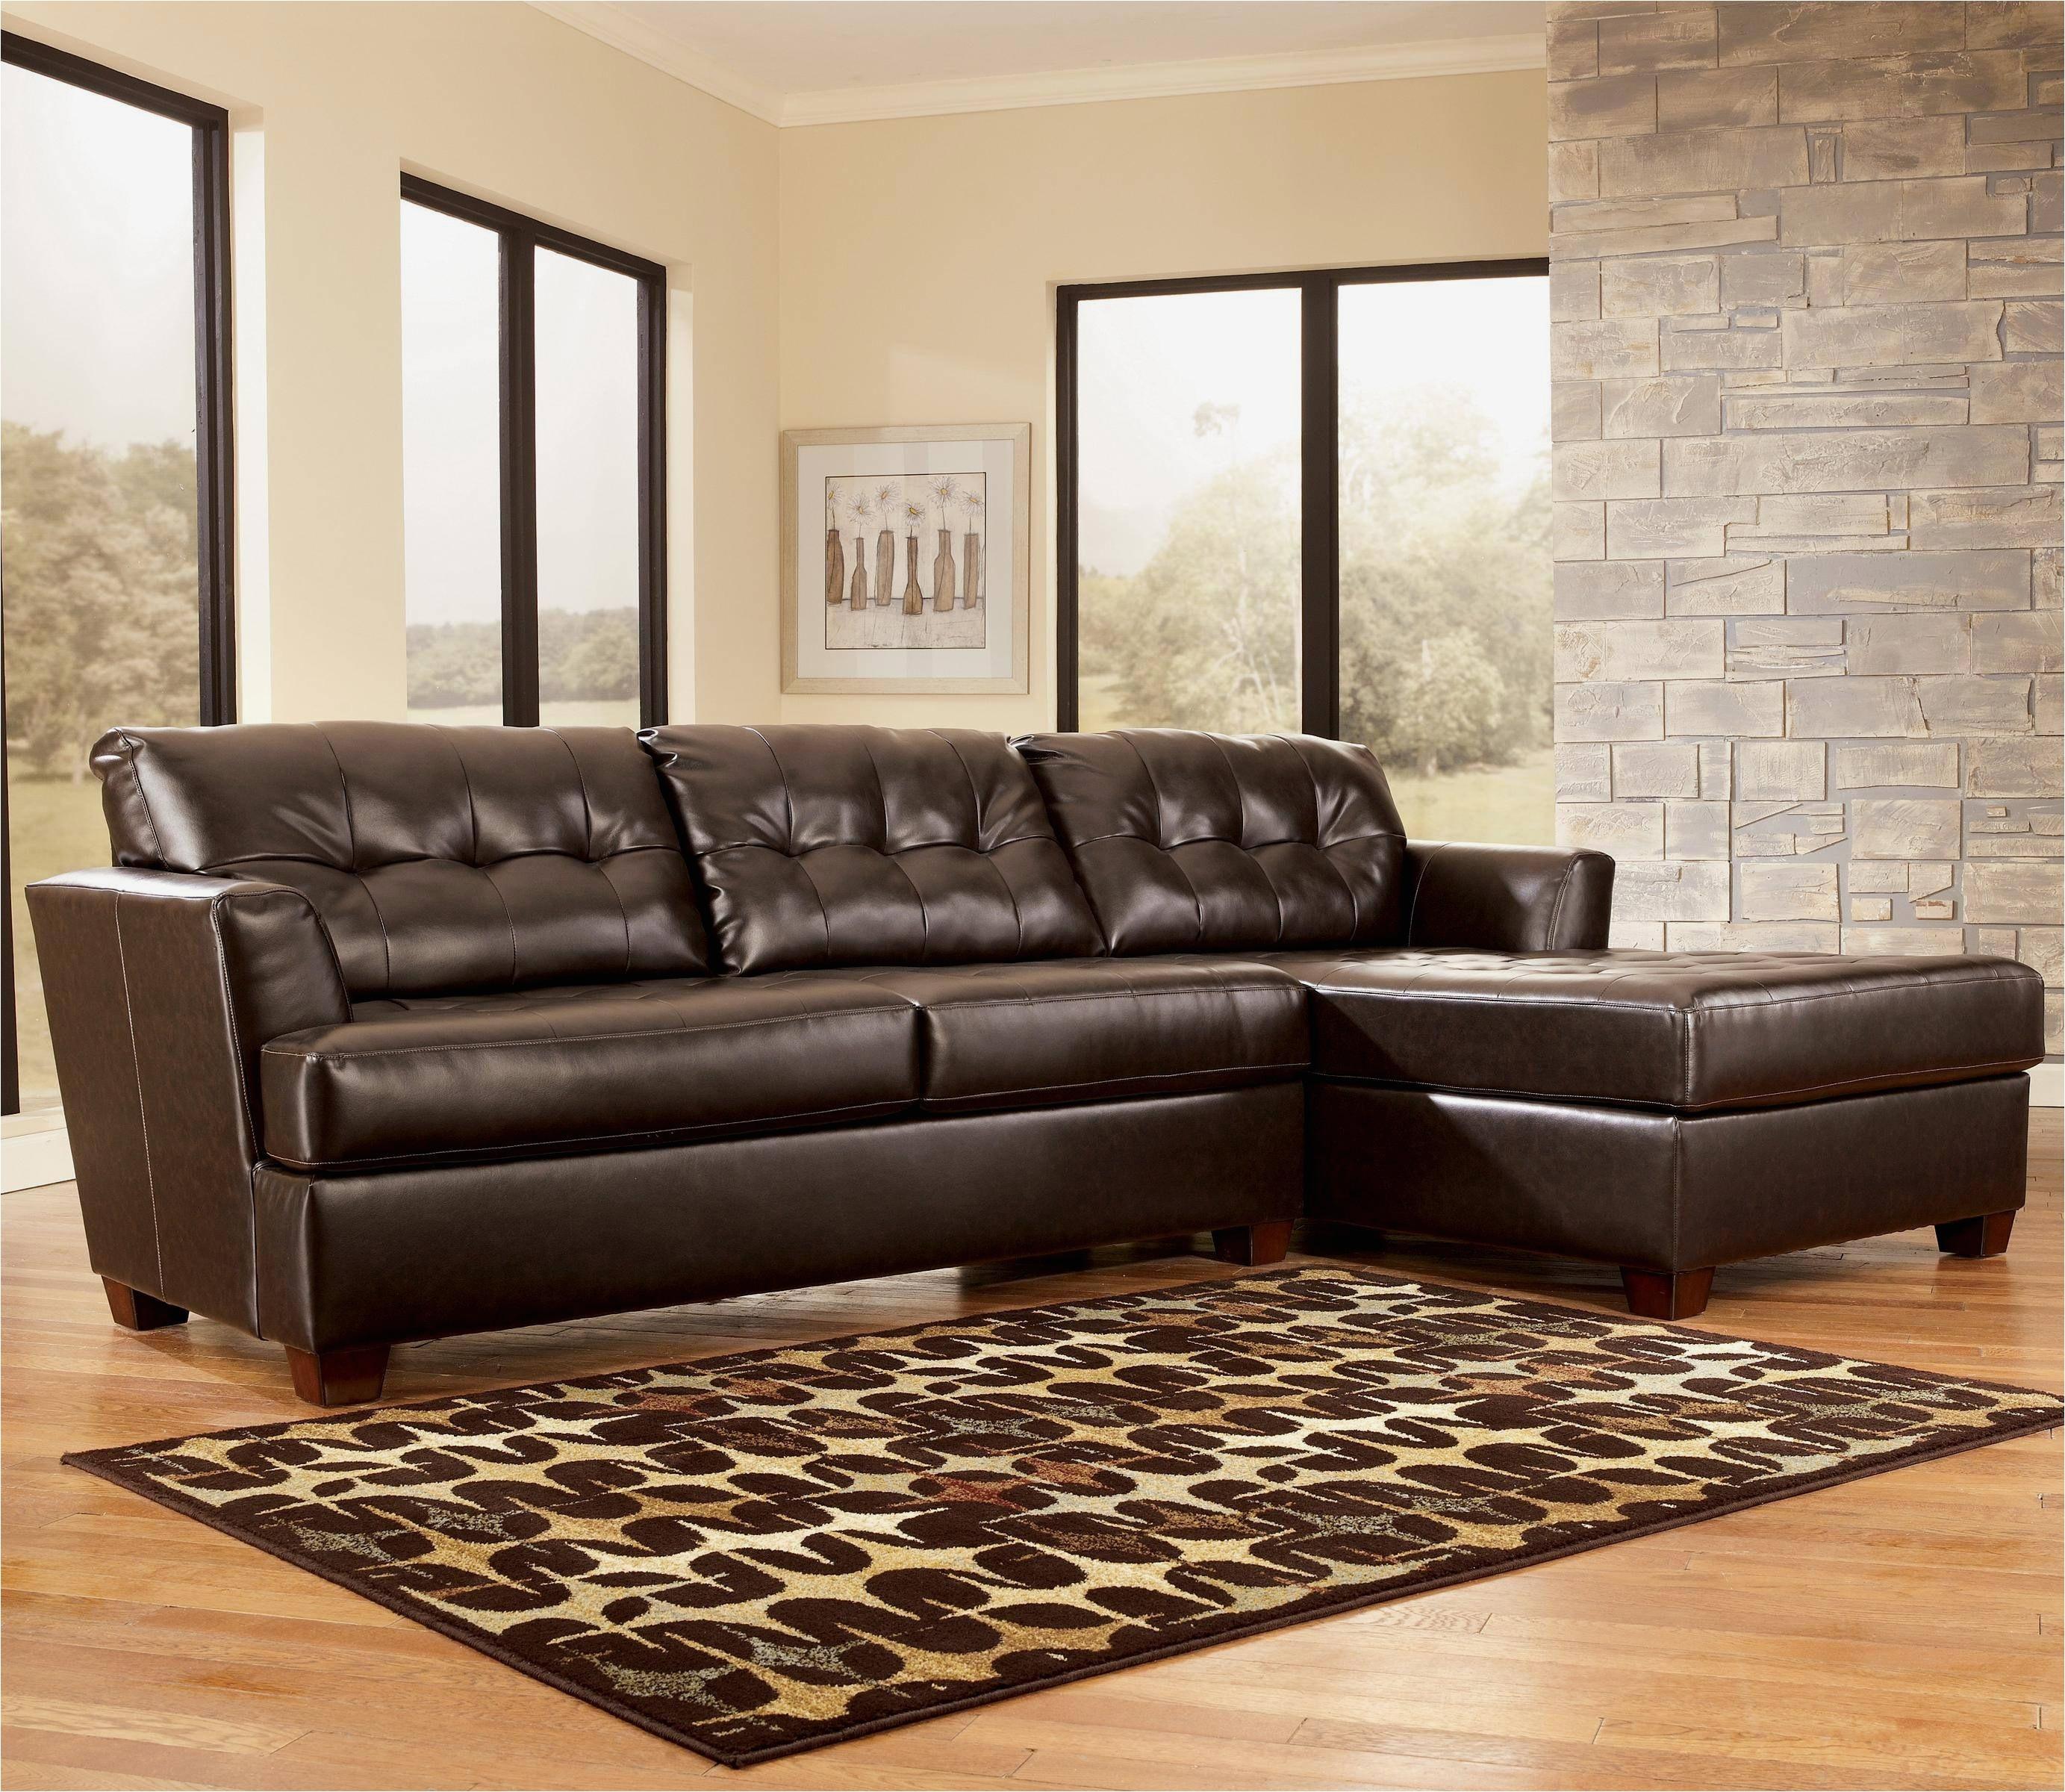 furniture plus mesa az best of 42 elegant mattress stores mesa unit image of 40 inspirational